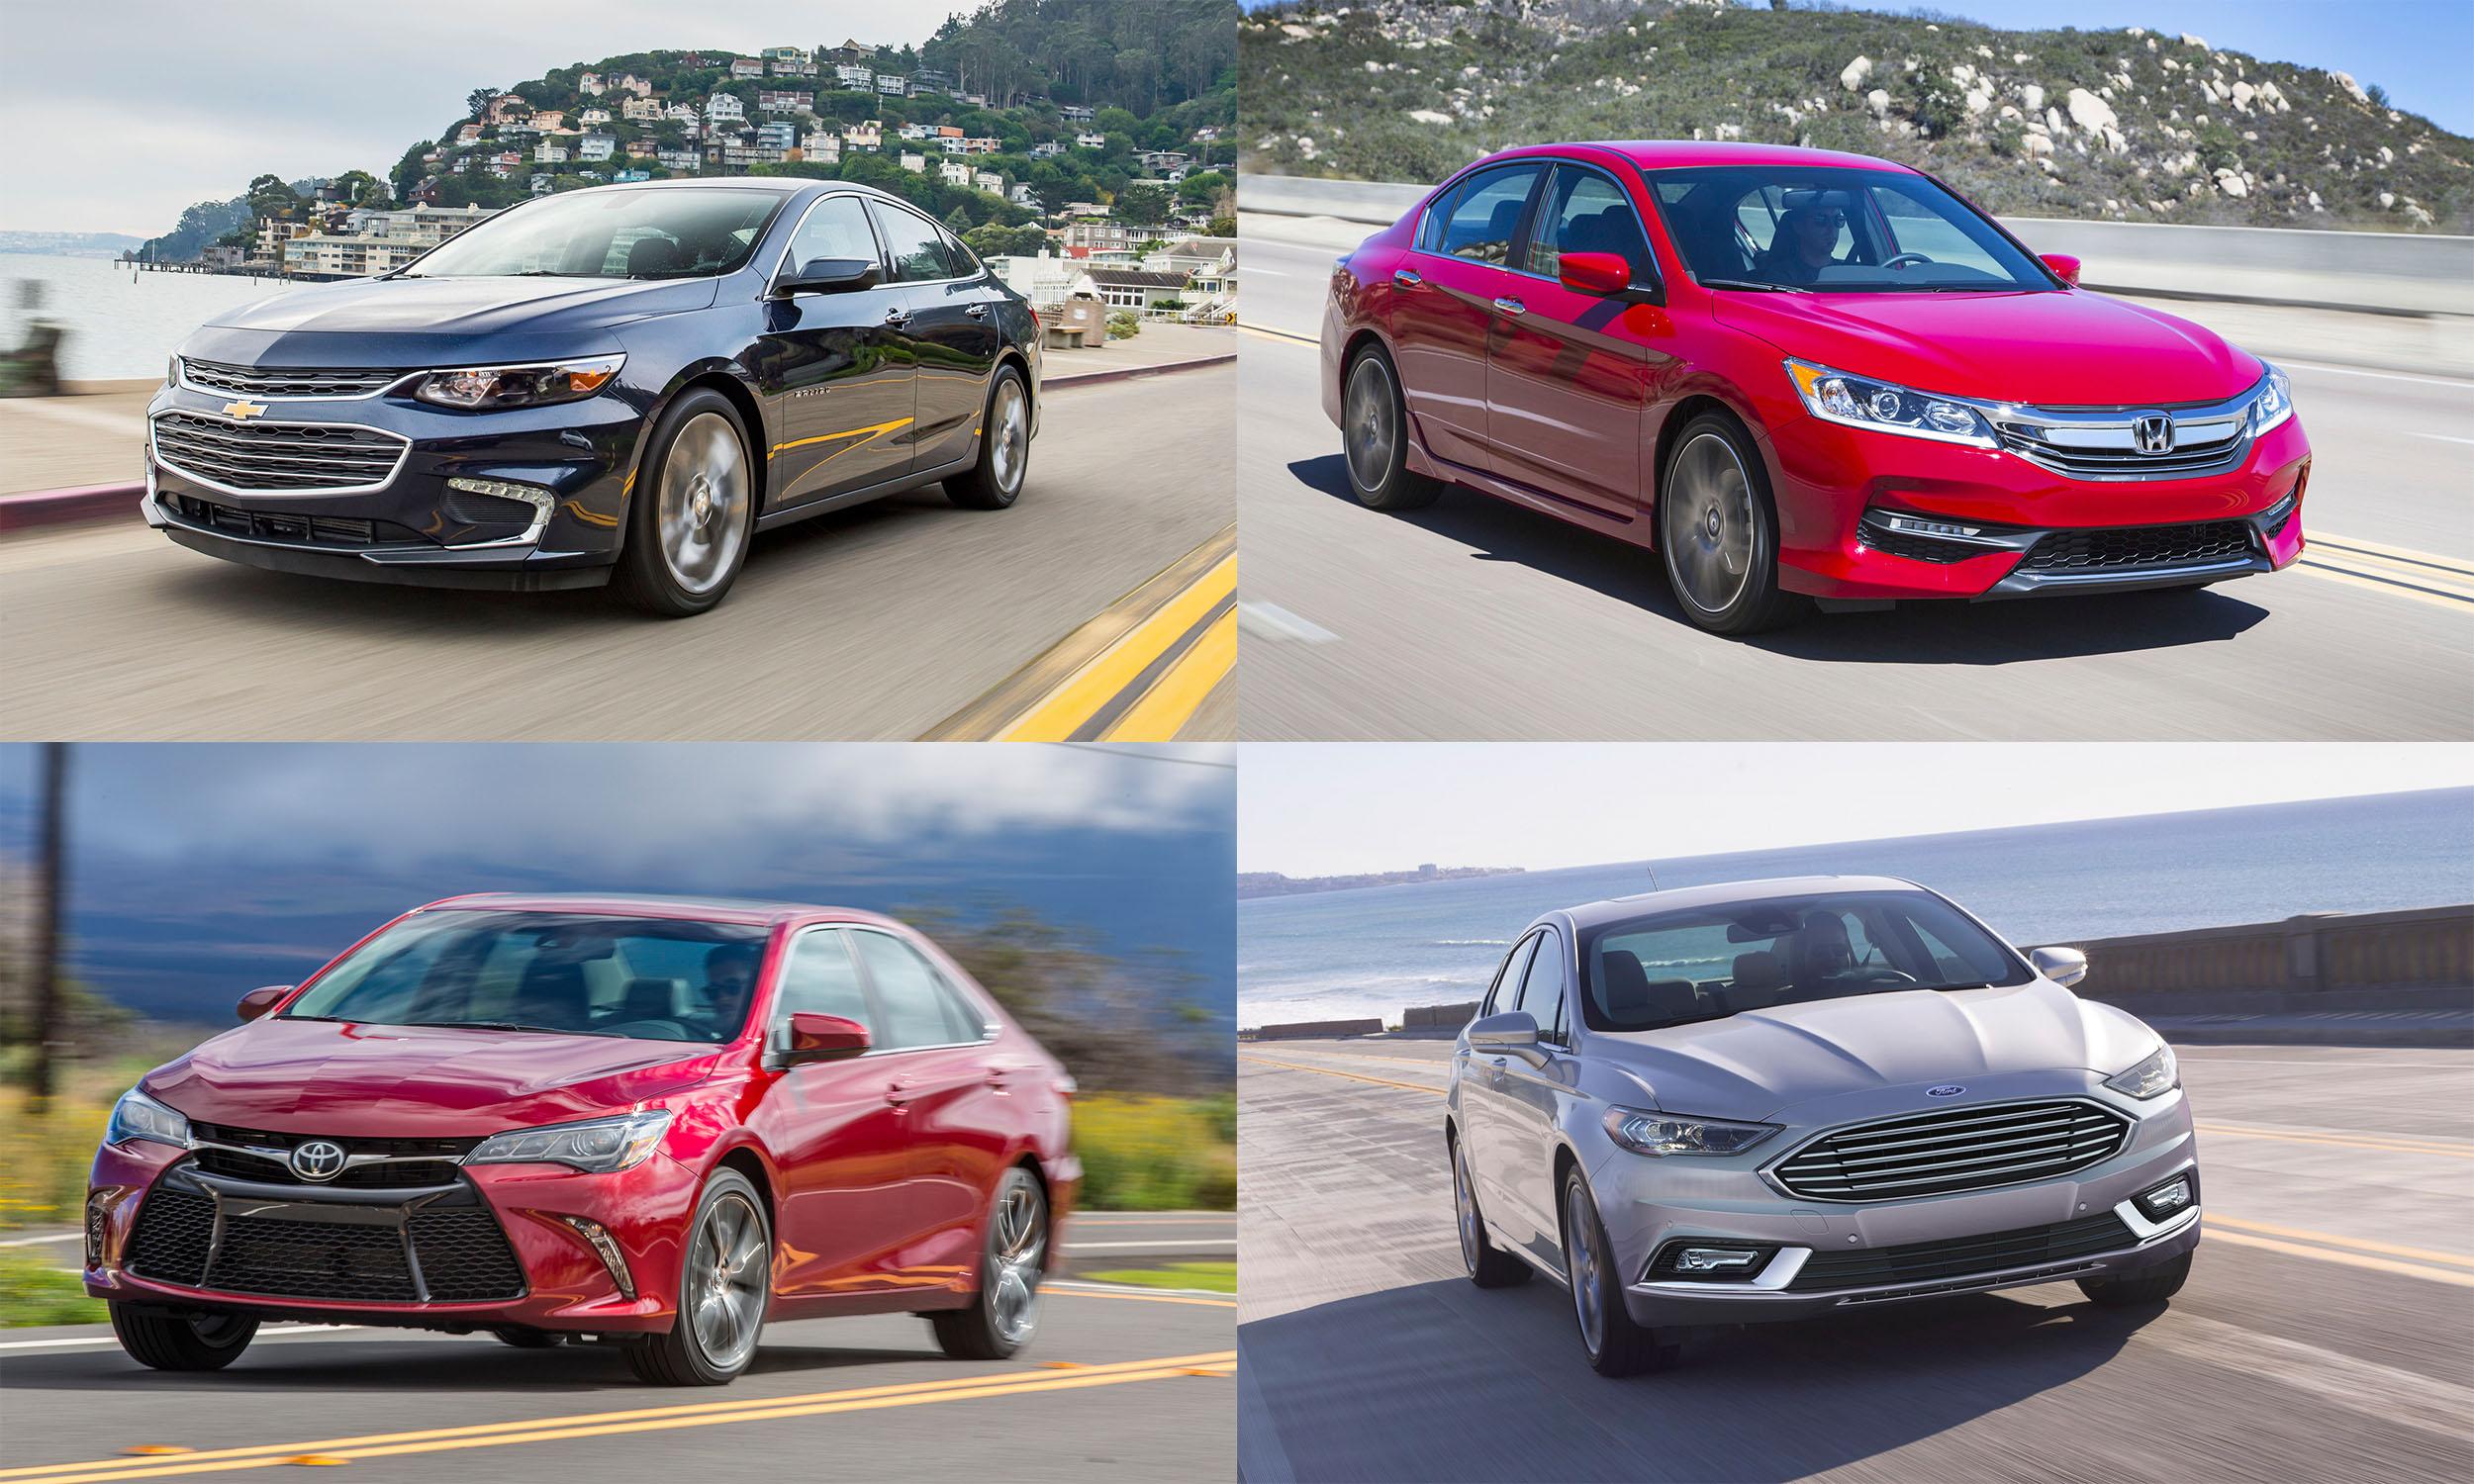 © General Motors, American Honda Motor Company, Ford Motor Company, Toyota Motor Sales, U.S.A.